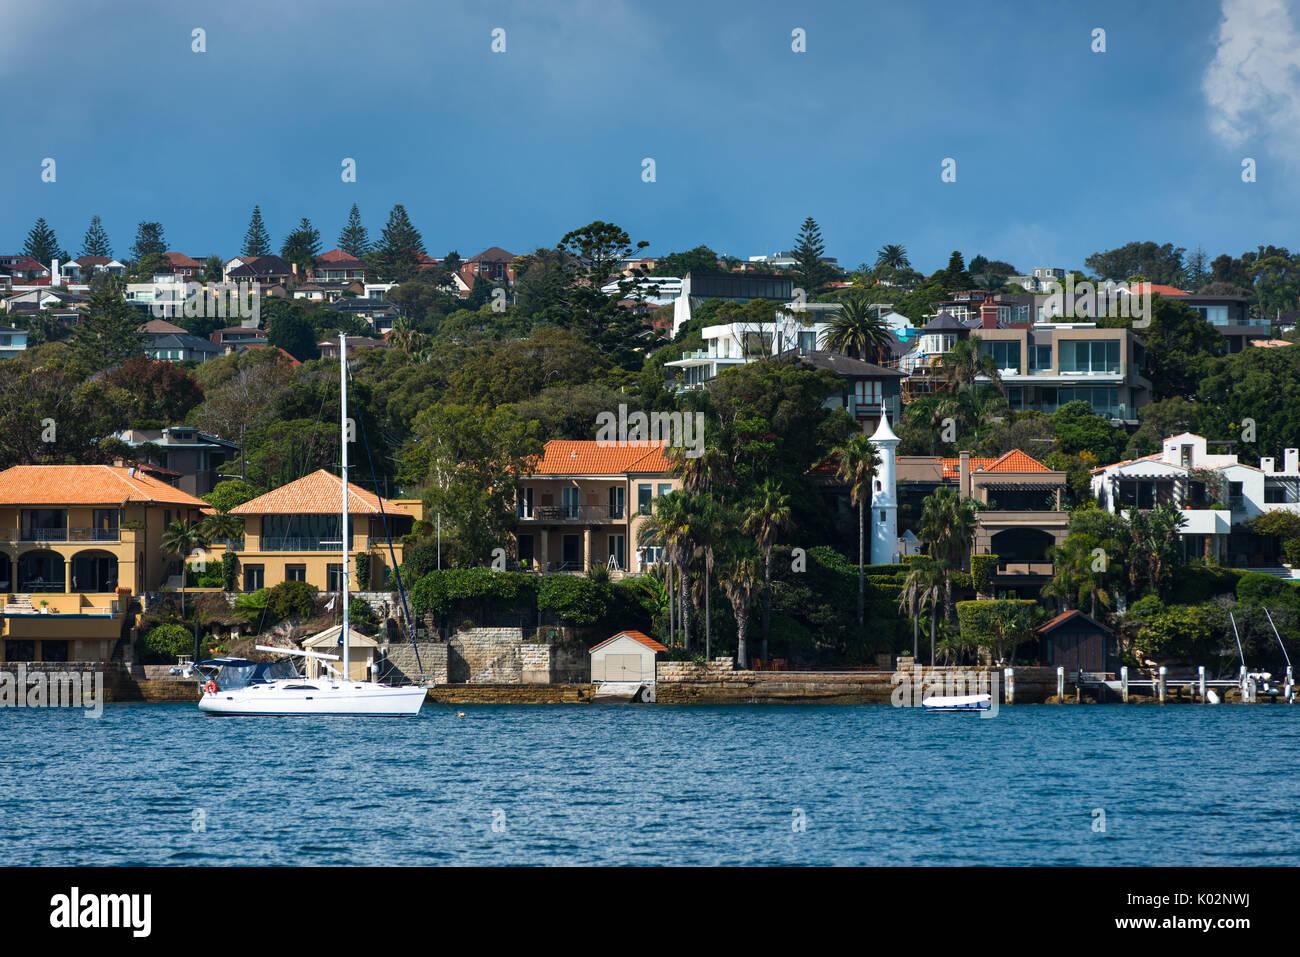 Watson's bay, Sydney, Australia. - Stock Image